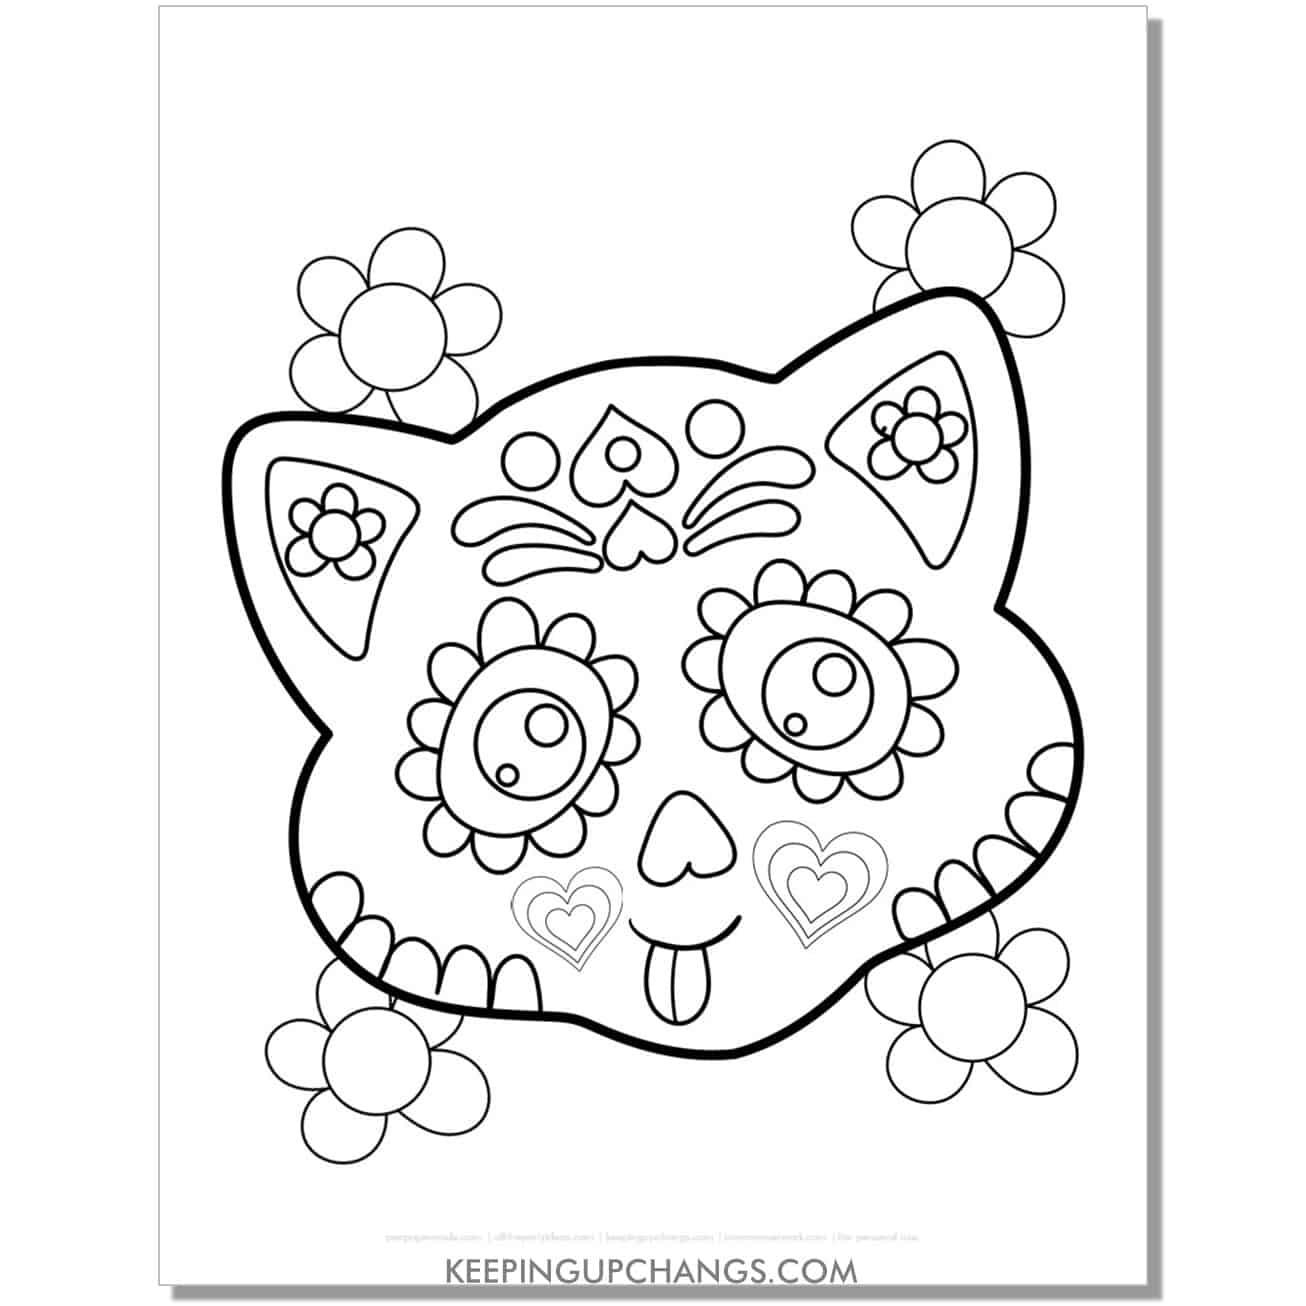 halloween cat face with dia de los muertos mask coloring page.